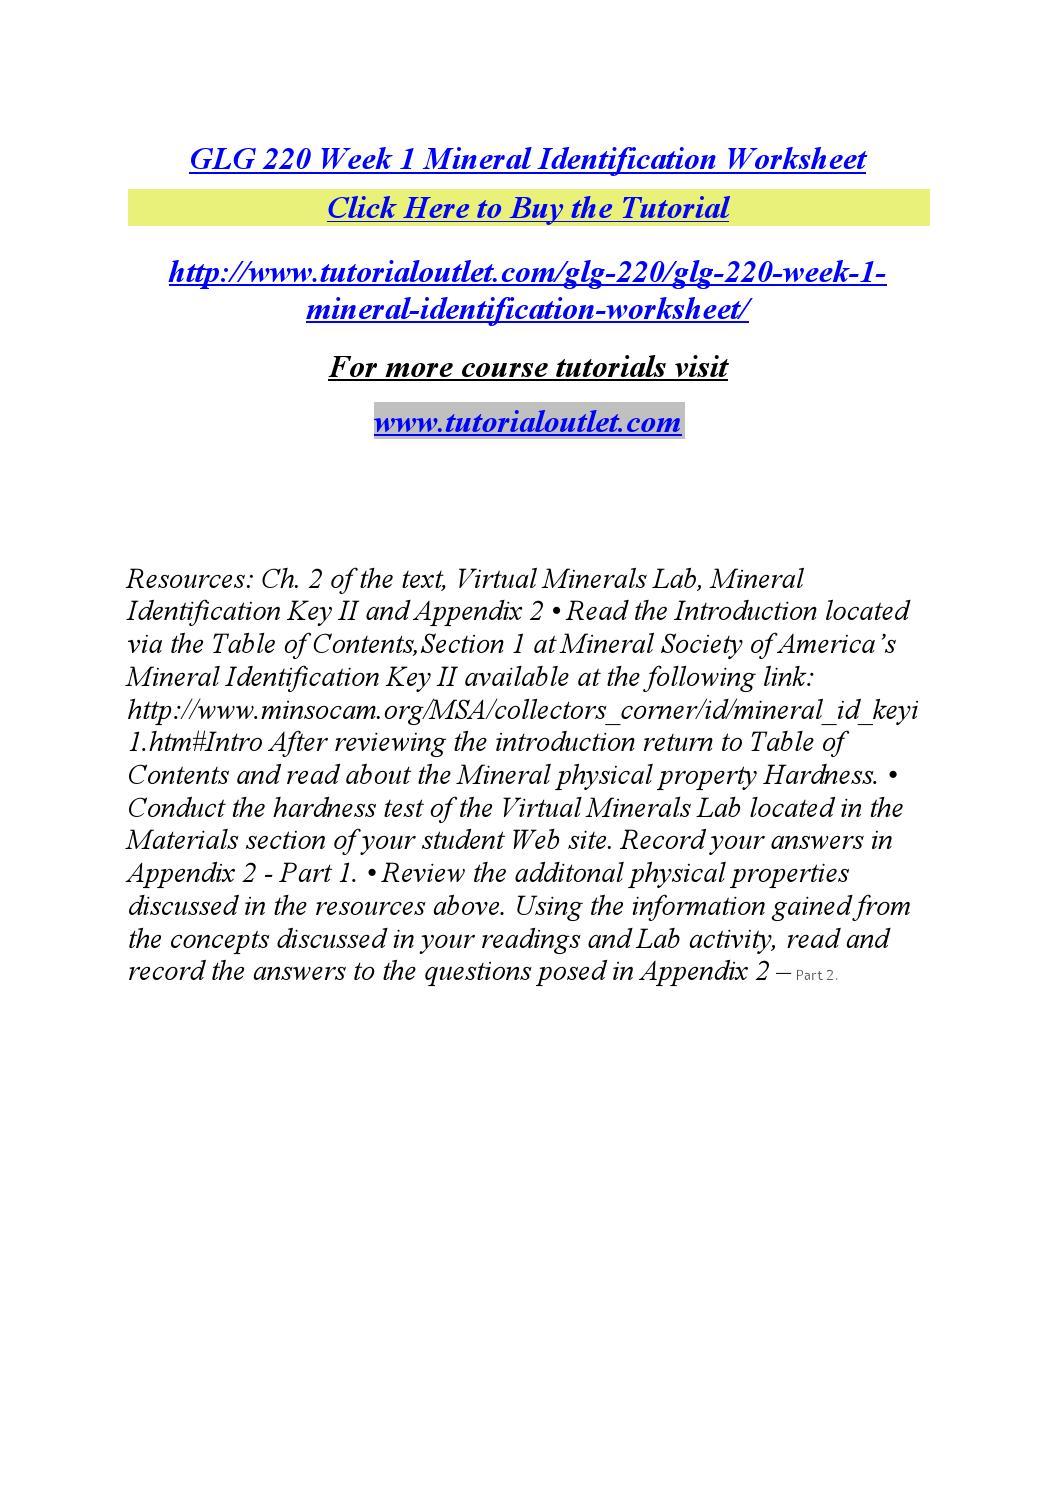 Glg 220 week 1 mineral identification worksheet by Stella4 issuu